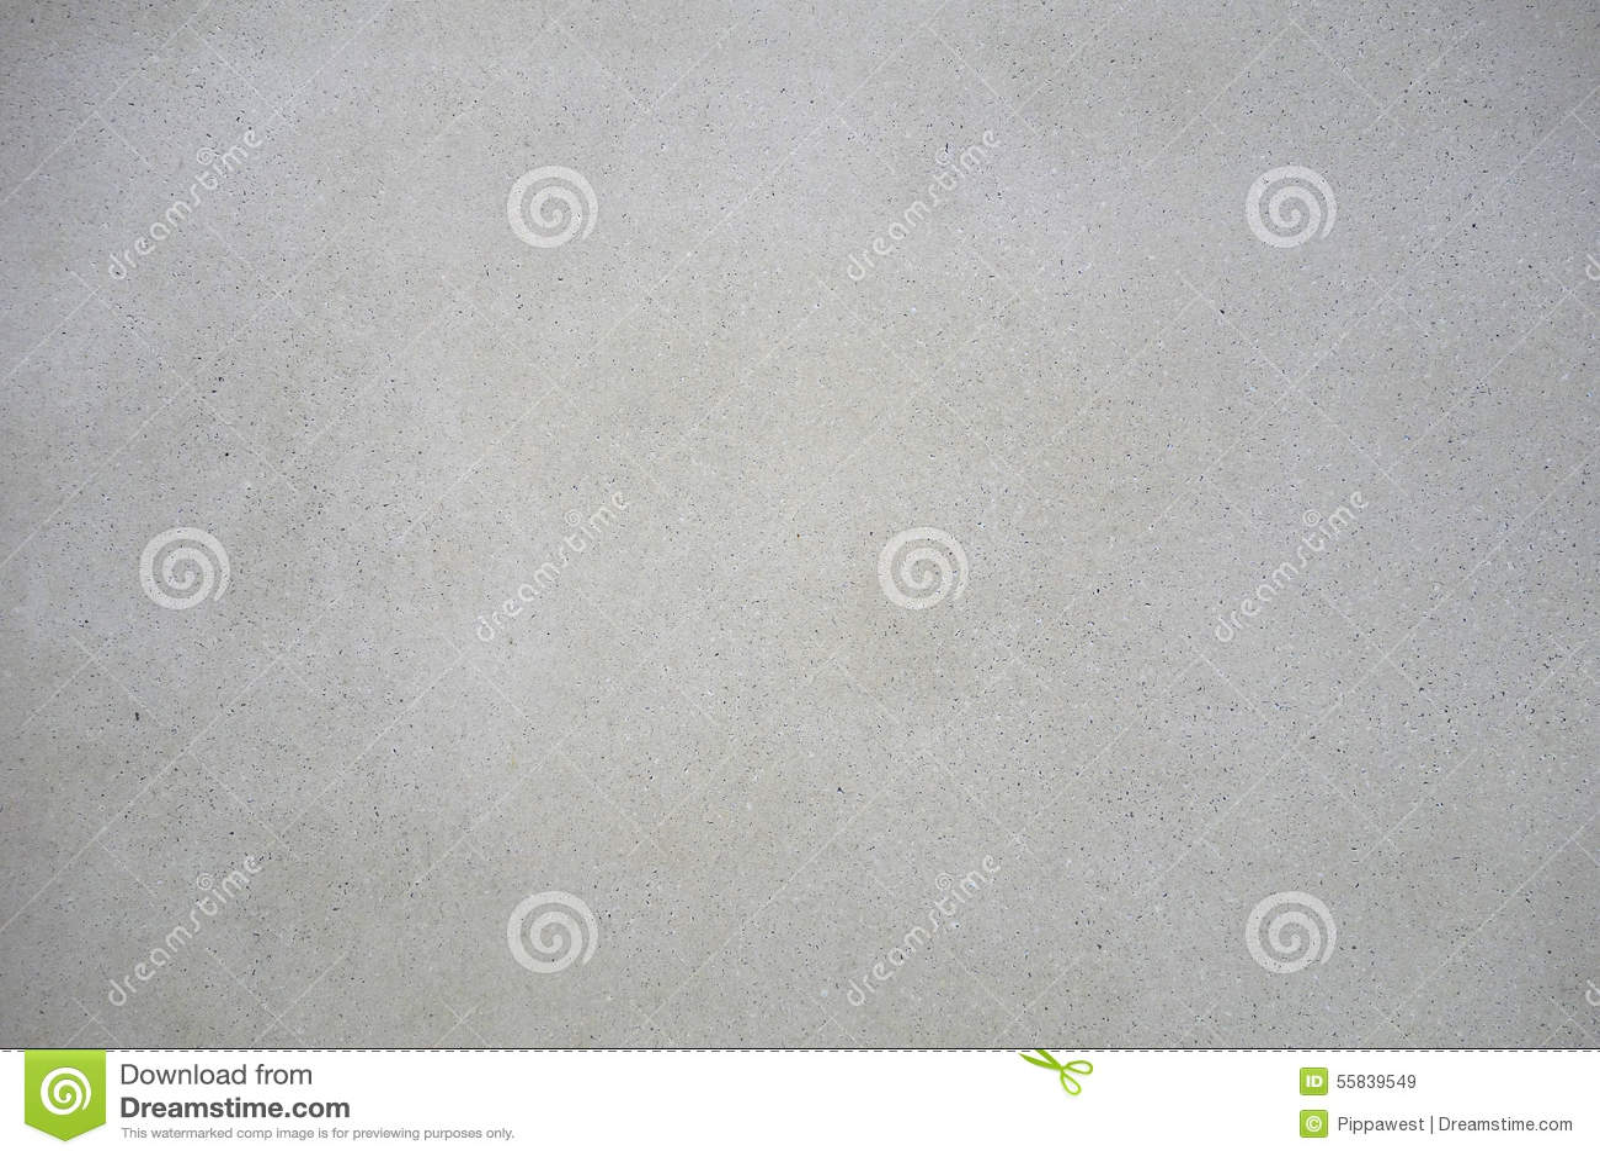 smooth concrete background - photo #39